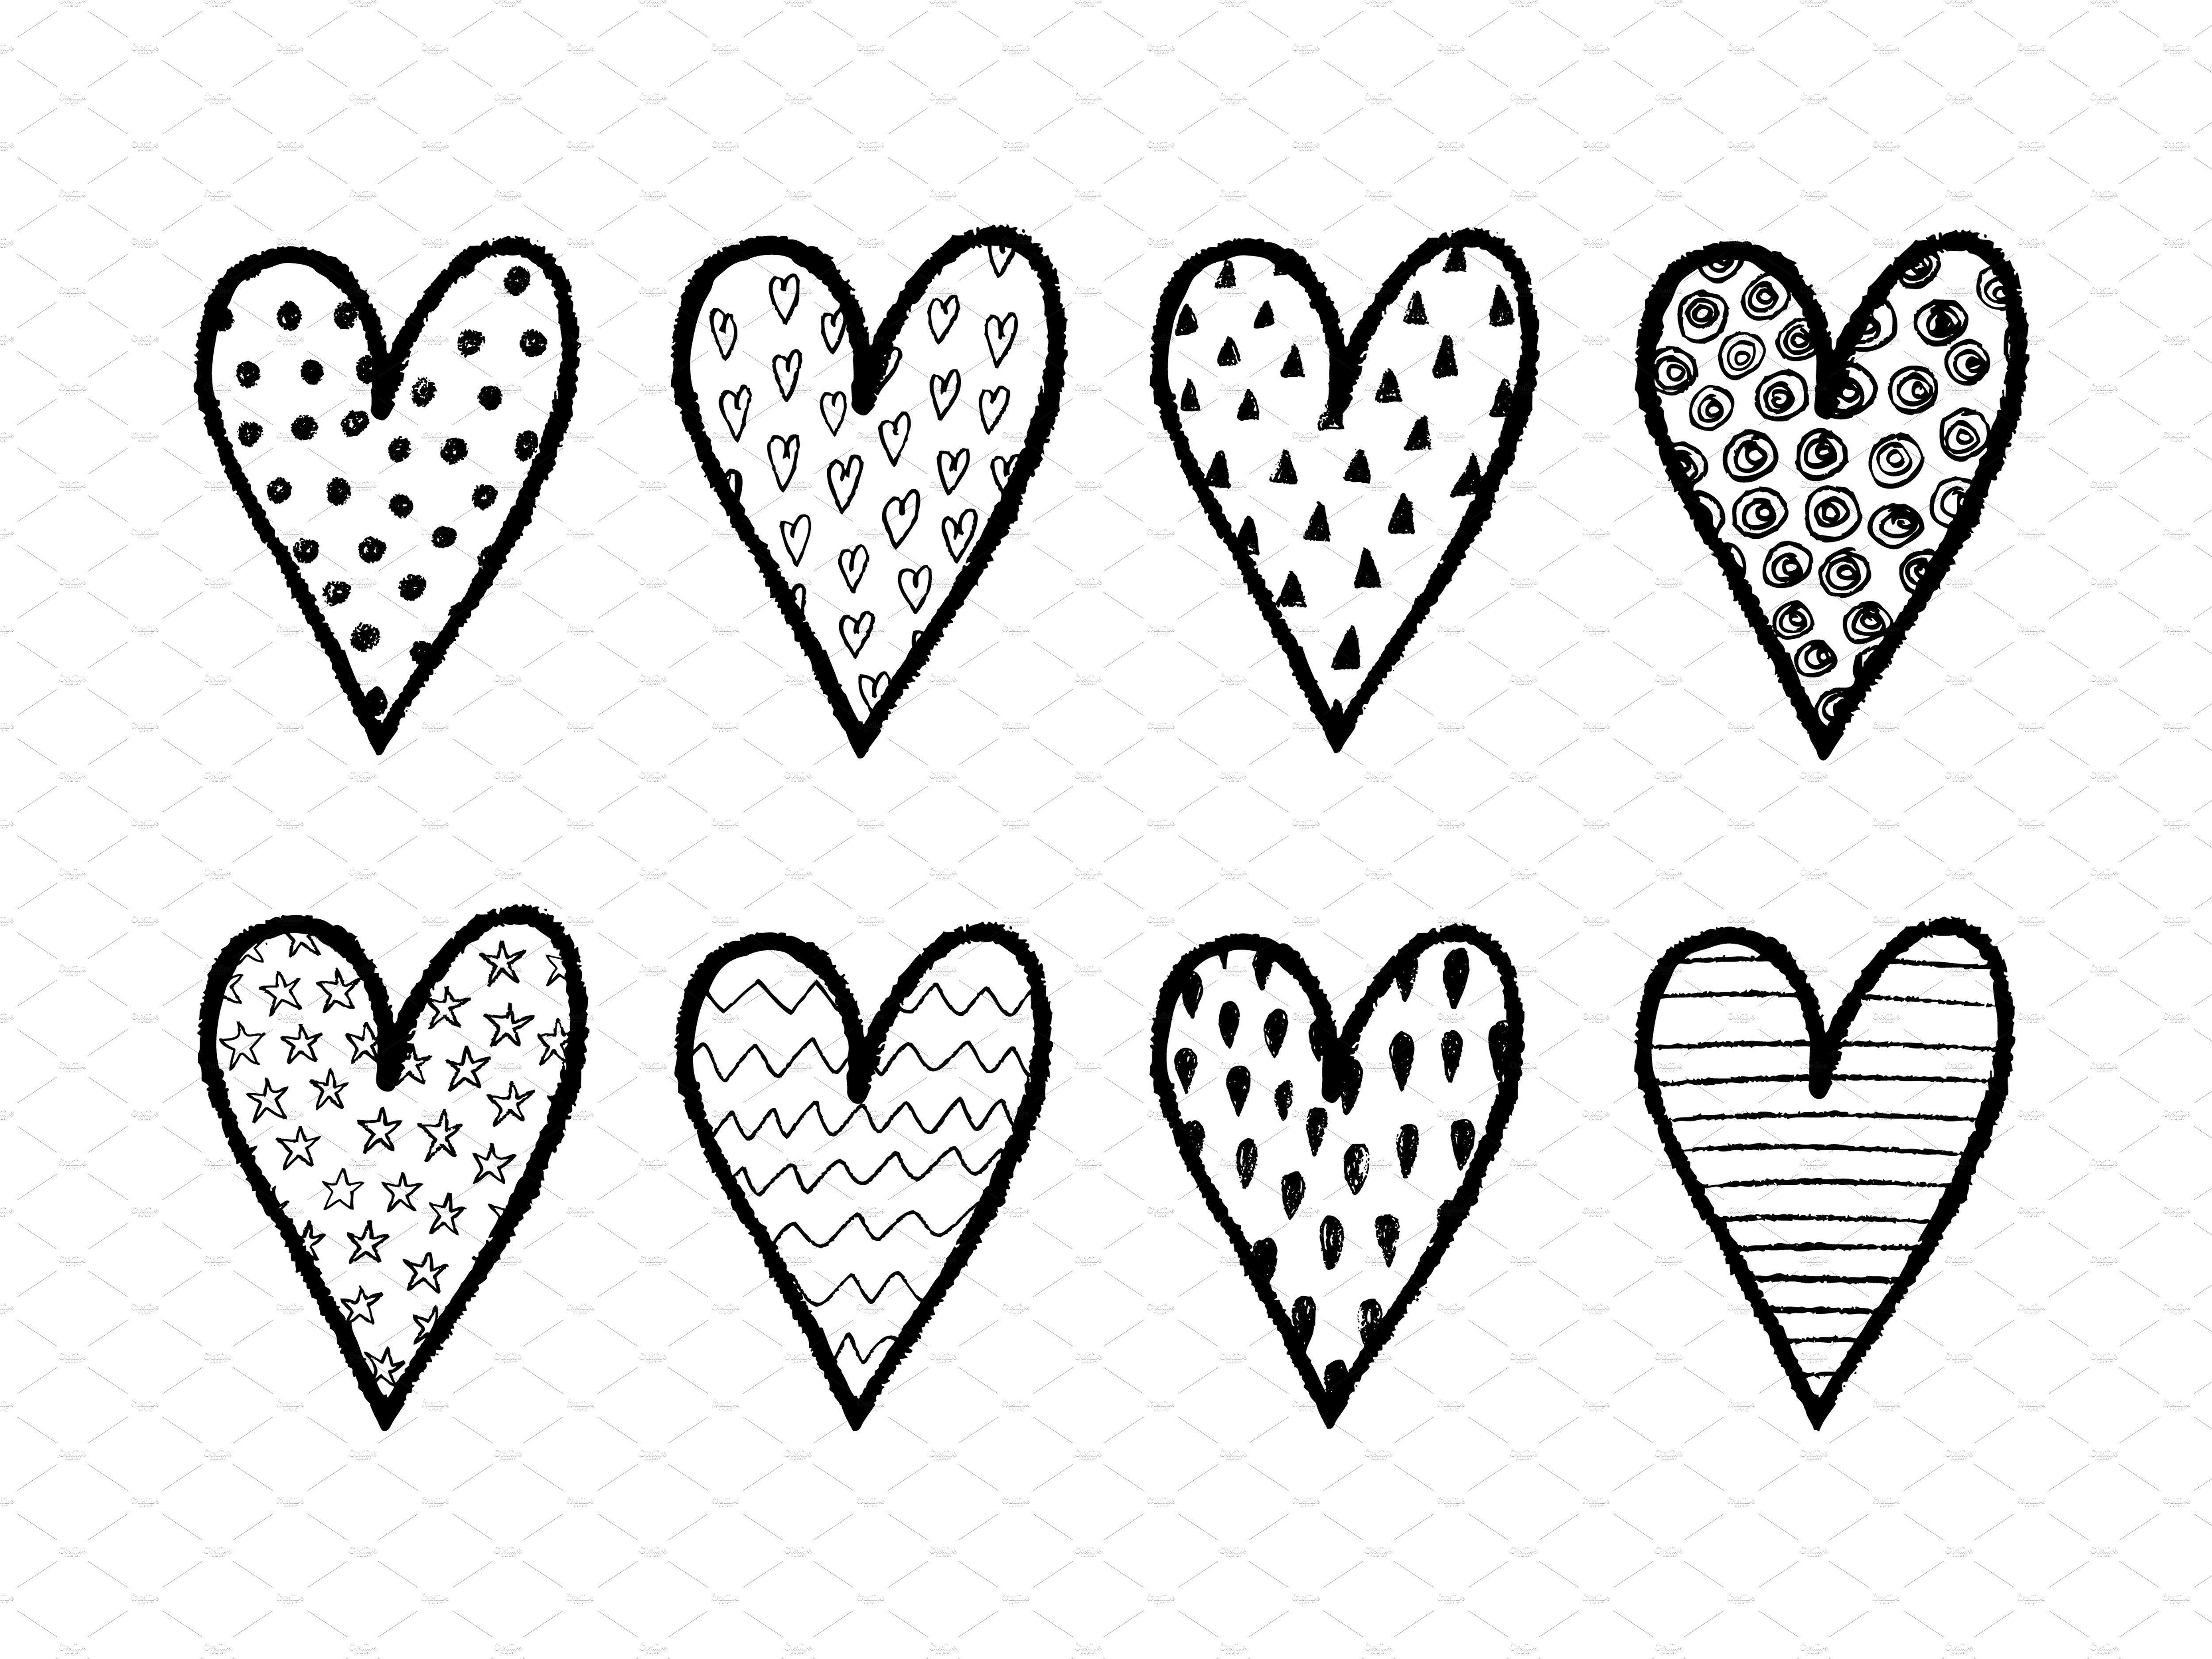 Drawn heart hand drawn Illustrations on drawn set Creative